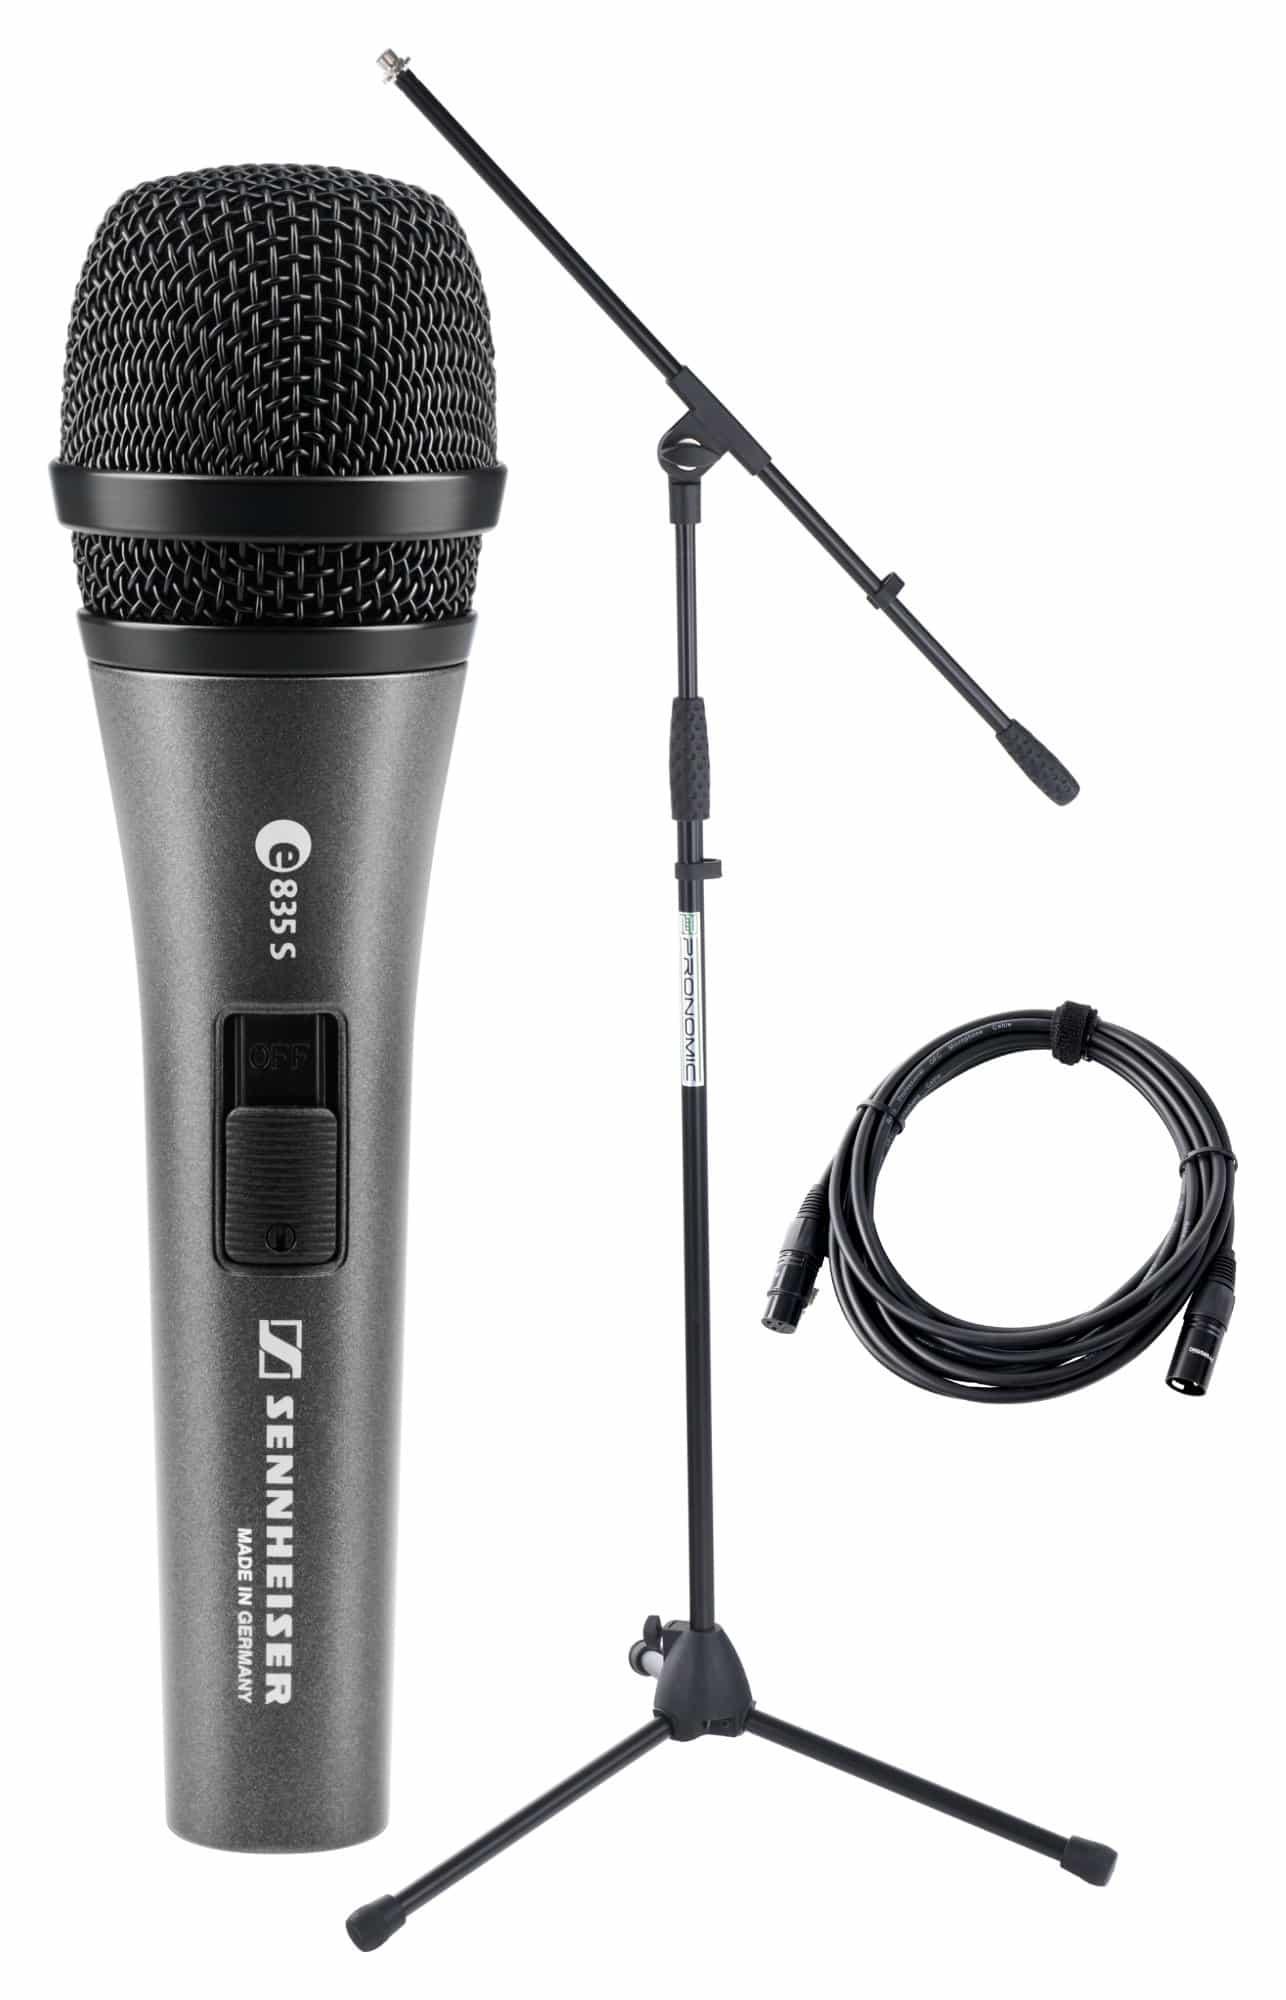 Sennheiser E 835 S Mikrofon Set Ständer Kabel